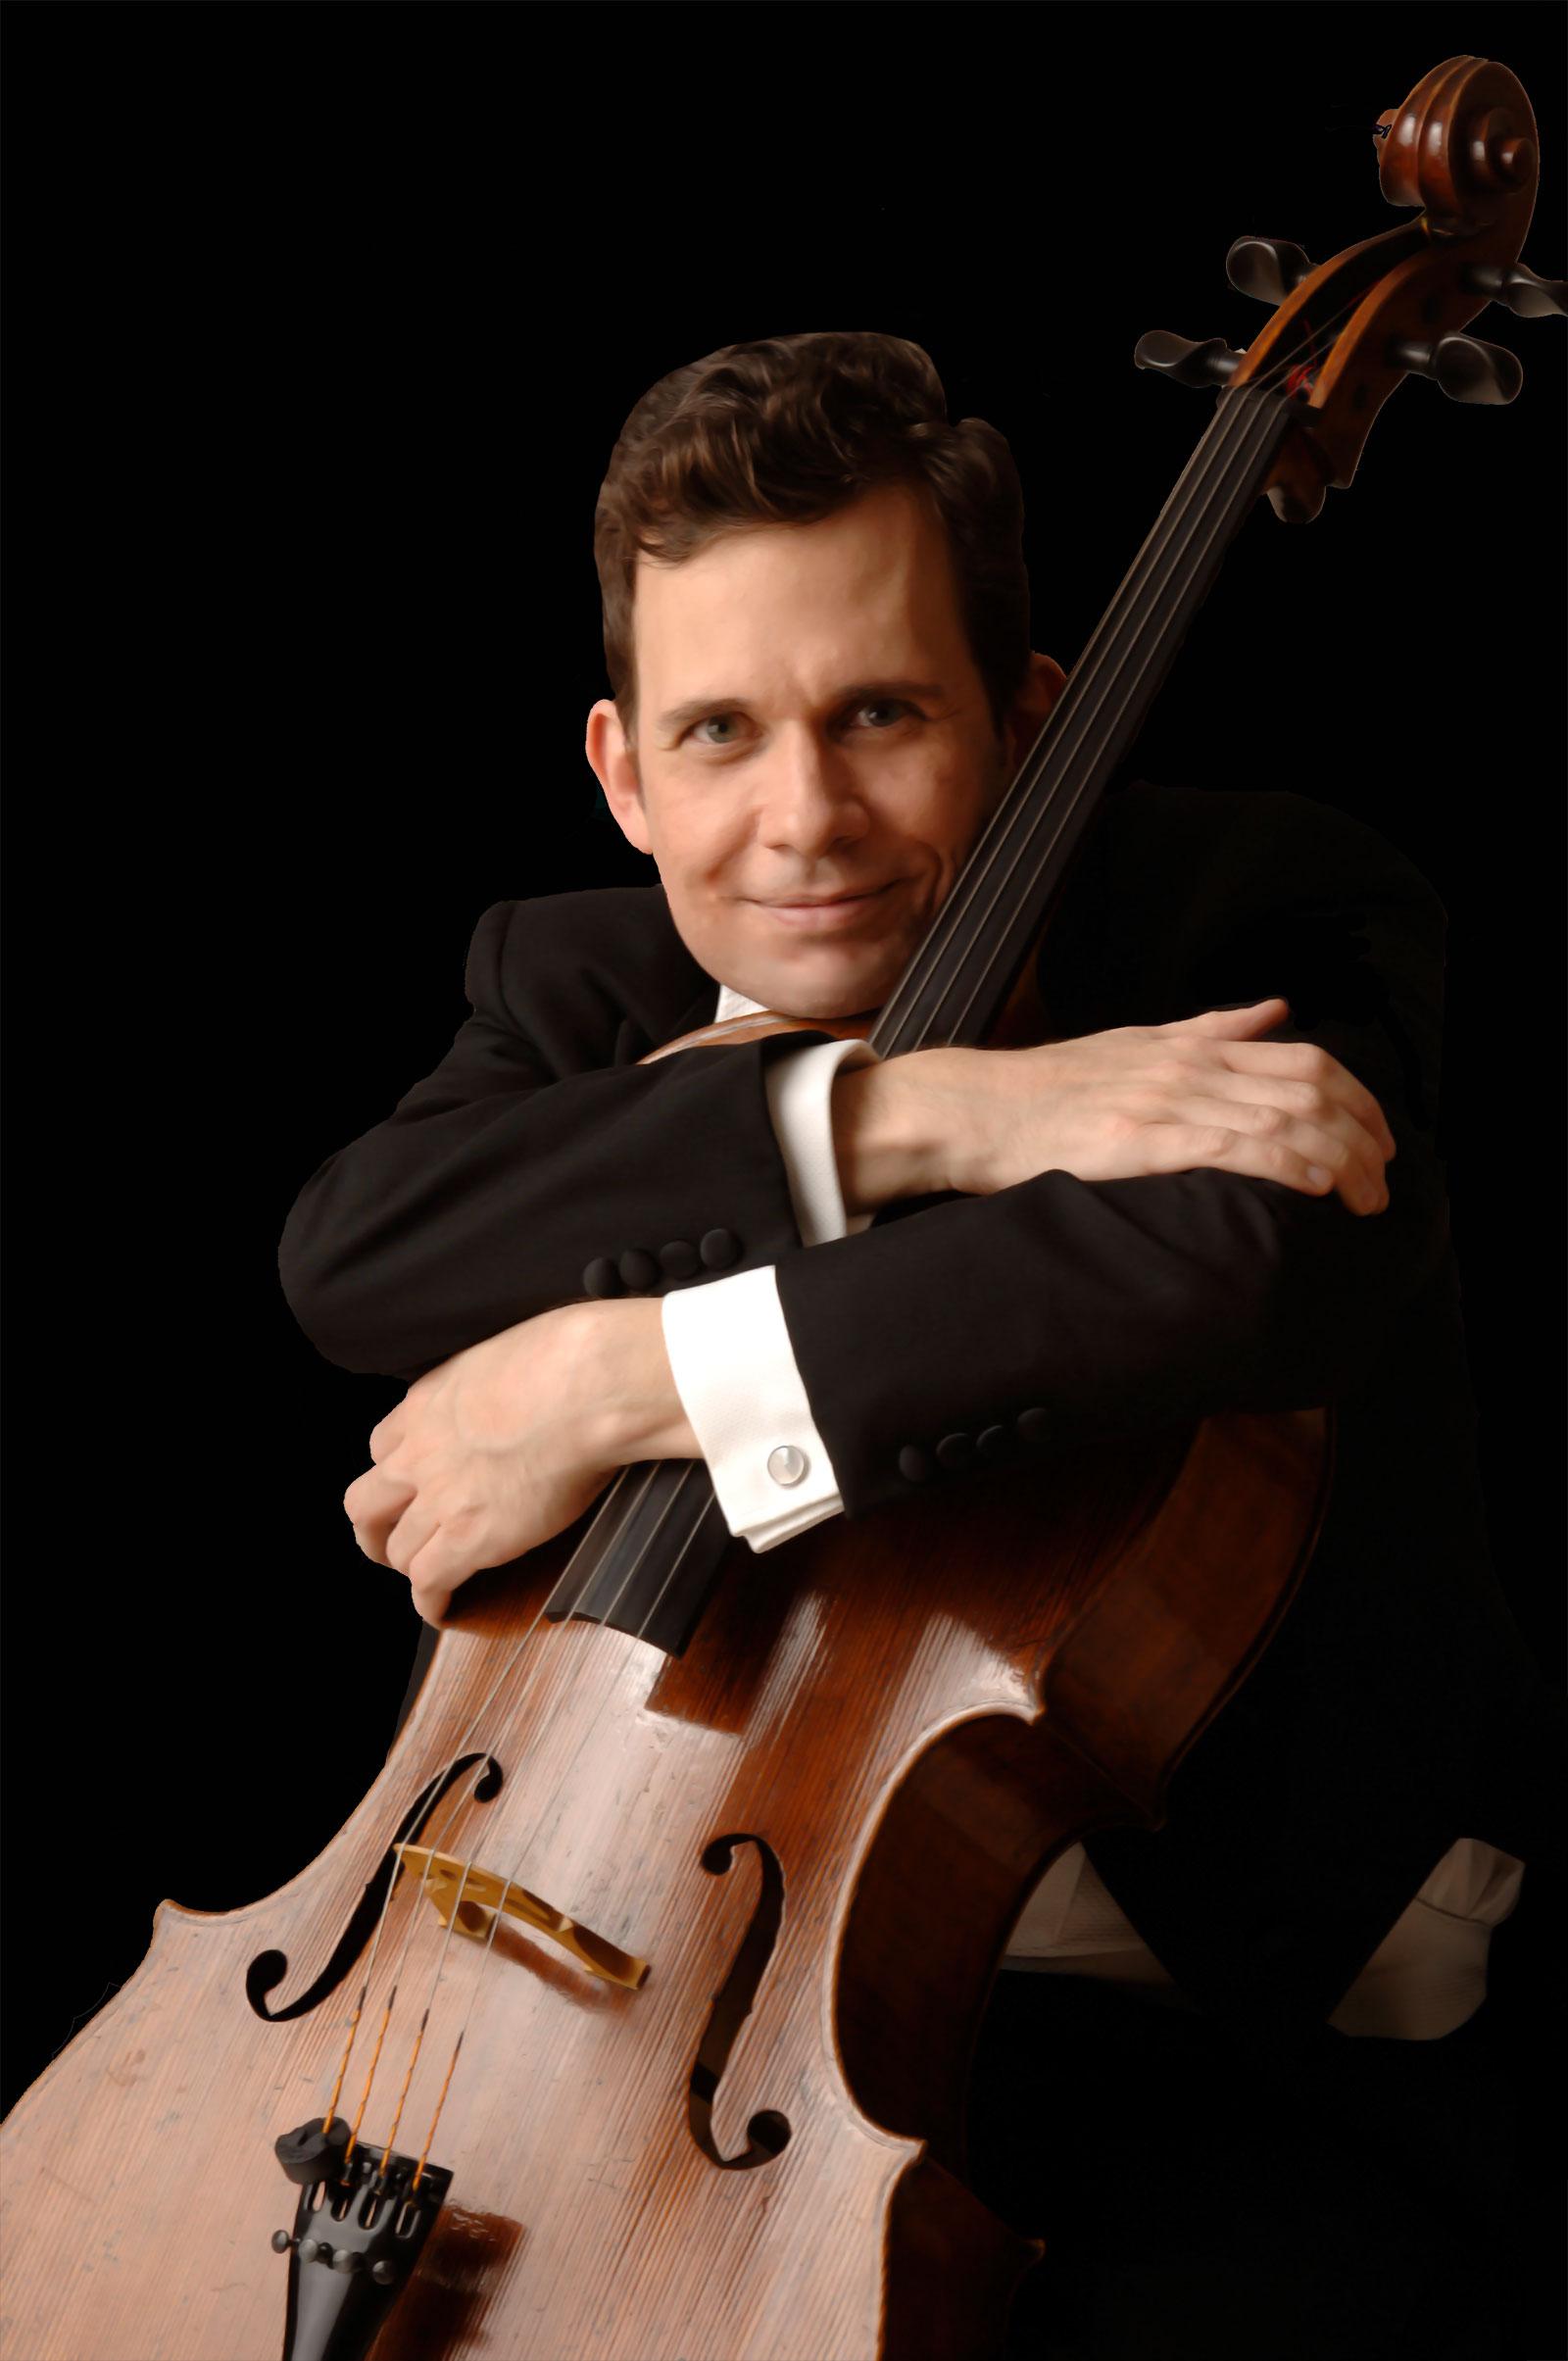 Cello stimmung